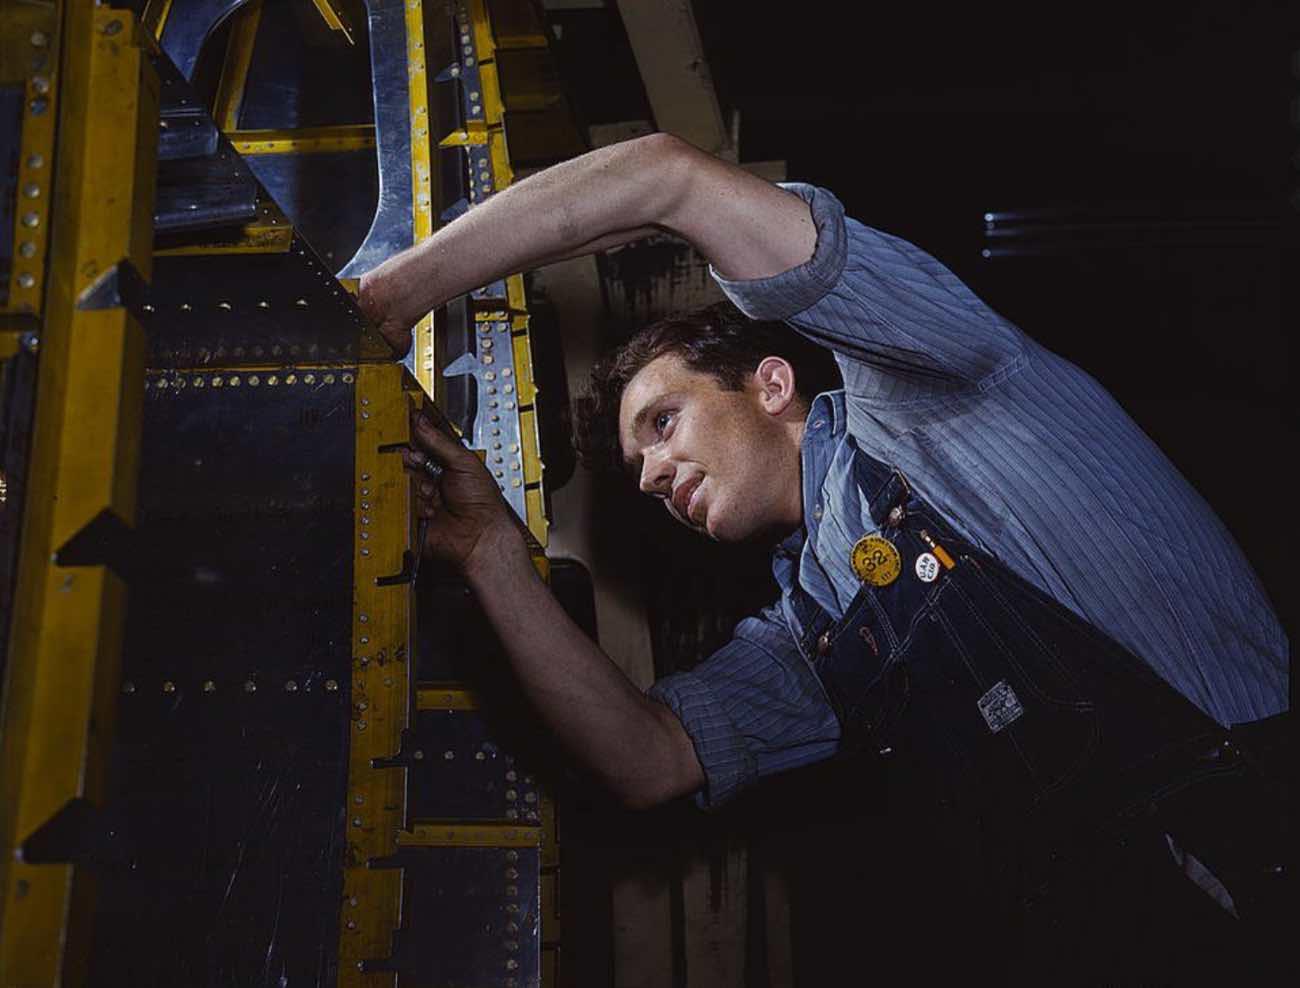 B-25 wing brace maintenance, colorized WWII photos